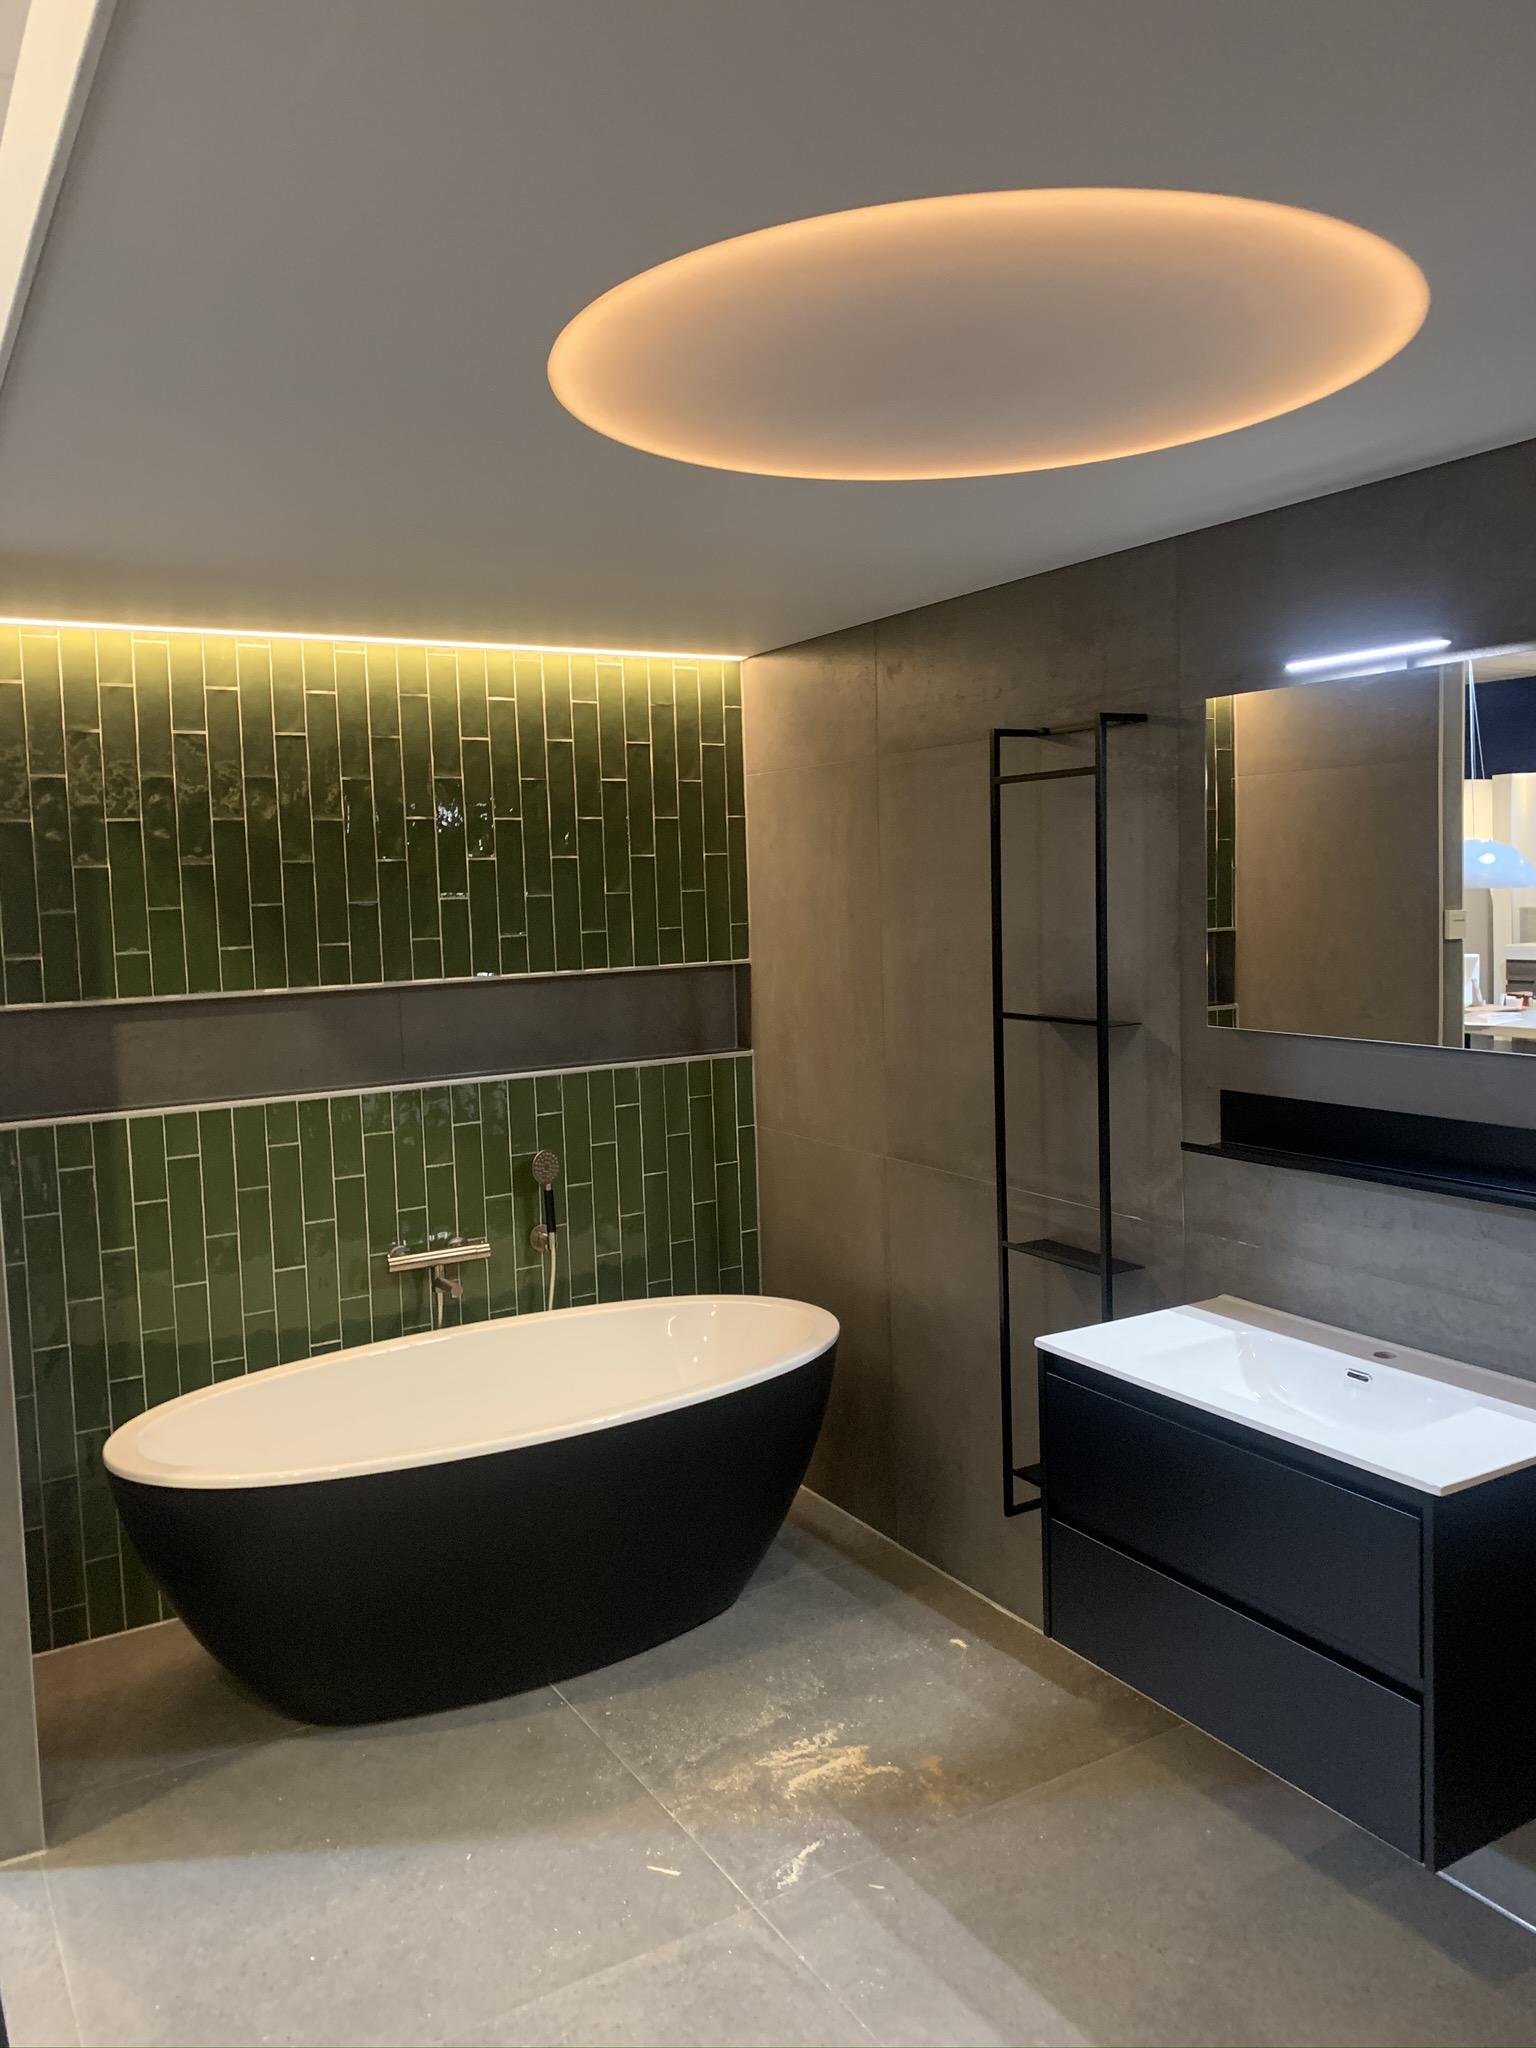 spanplafond met cirkel LED in badkamer